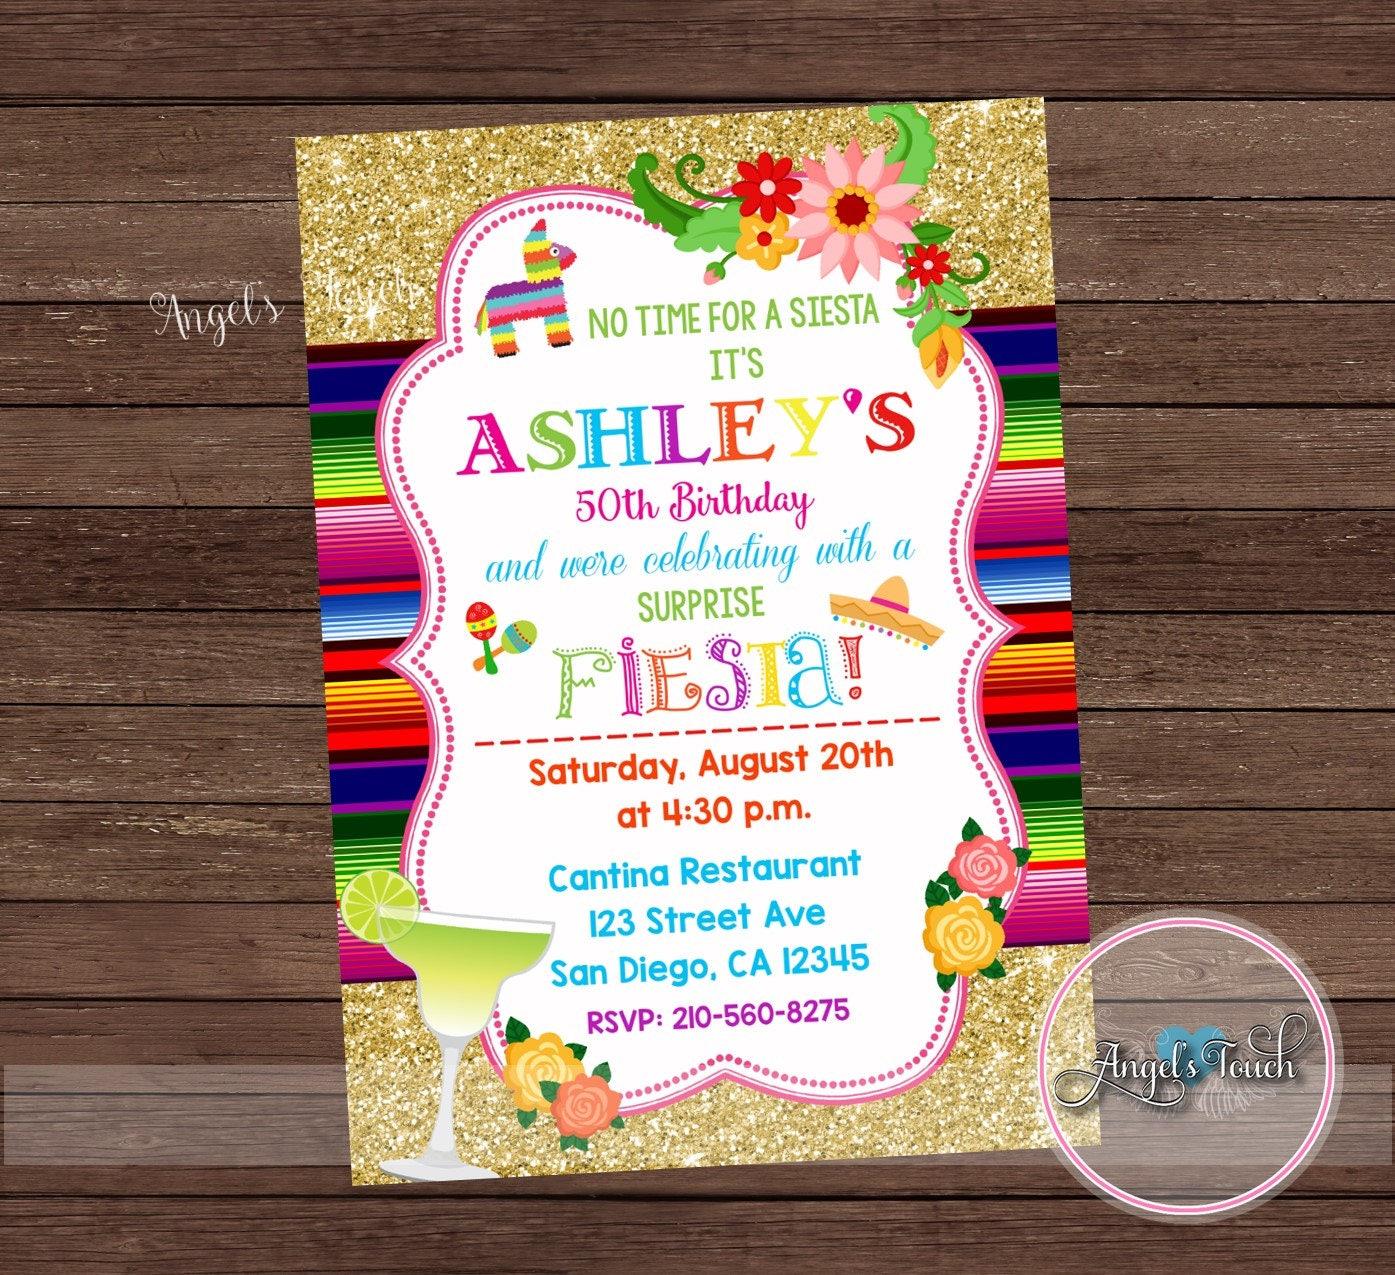 Fiesta Invitation, Fiesta Birthday Party Invitation, Mexican Fiesta ...